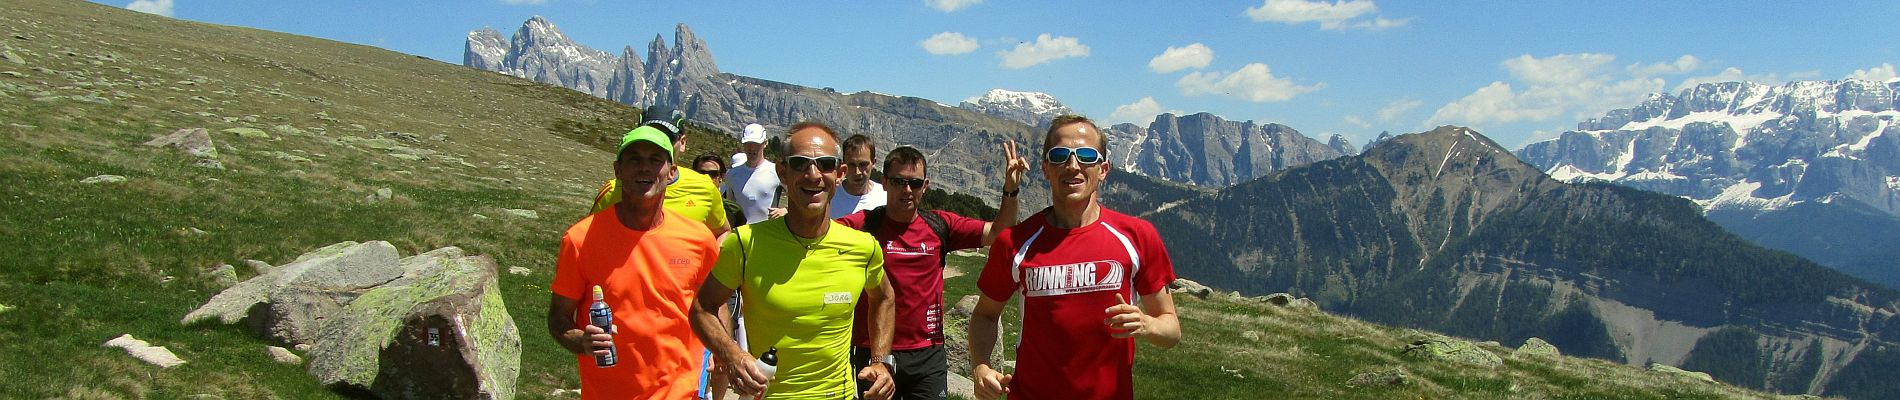 RUNNING Company Seiser Alm Laufurlaub: Laufwochenende oder ganze Laufwoche